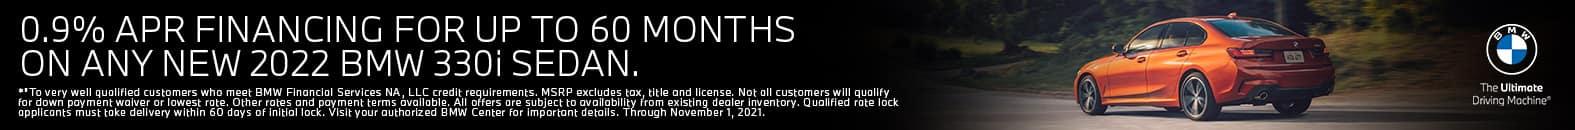 0.9% APR Financing For Up To 60 Months - 2022 BMW 330i Sedan - Bert Ogden BMW in McAllen, Texas